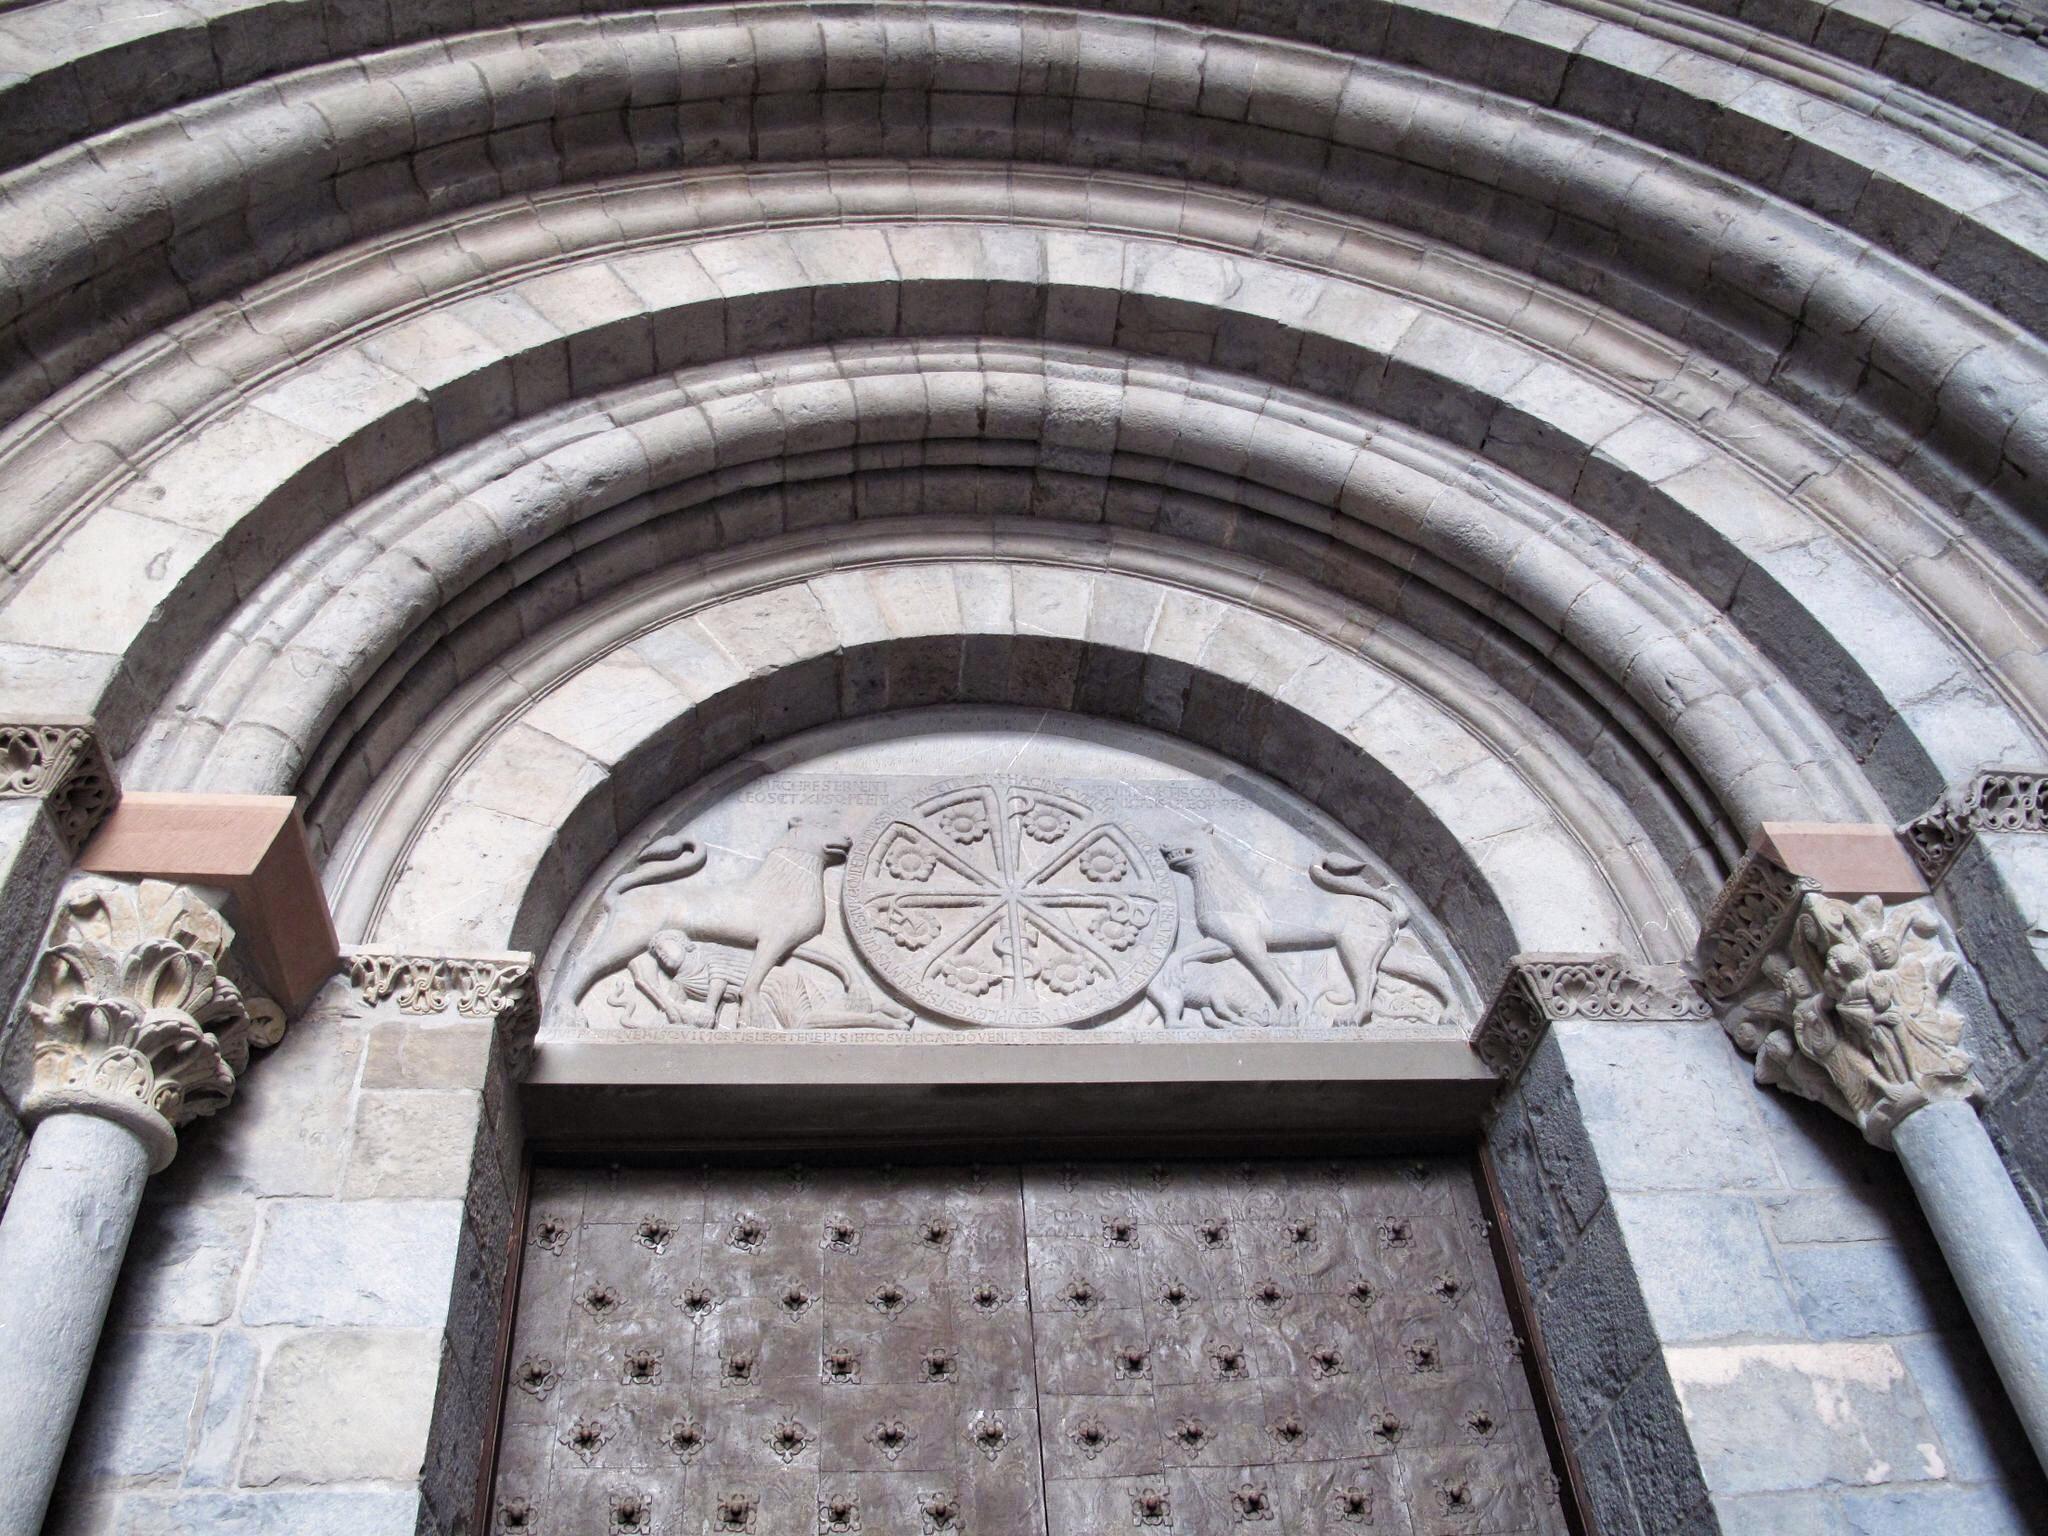 museo diocesano de jaca_claustro_vista estereoscopica_catedral_crismon